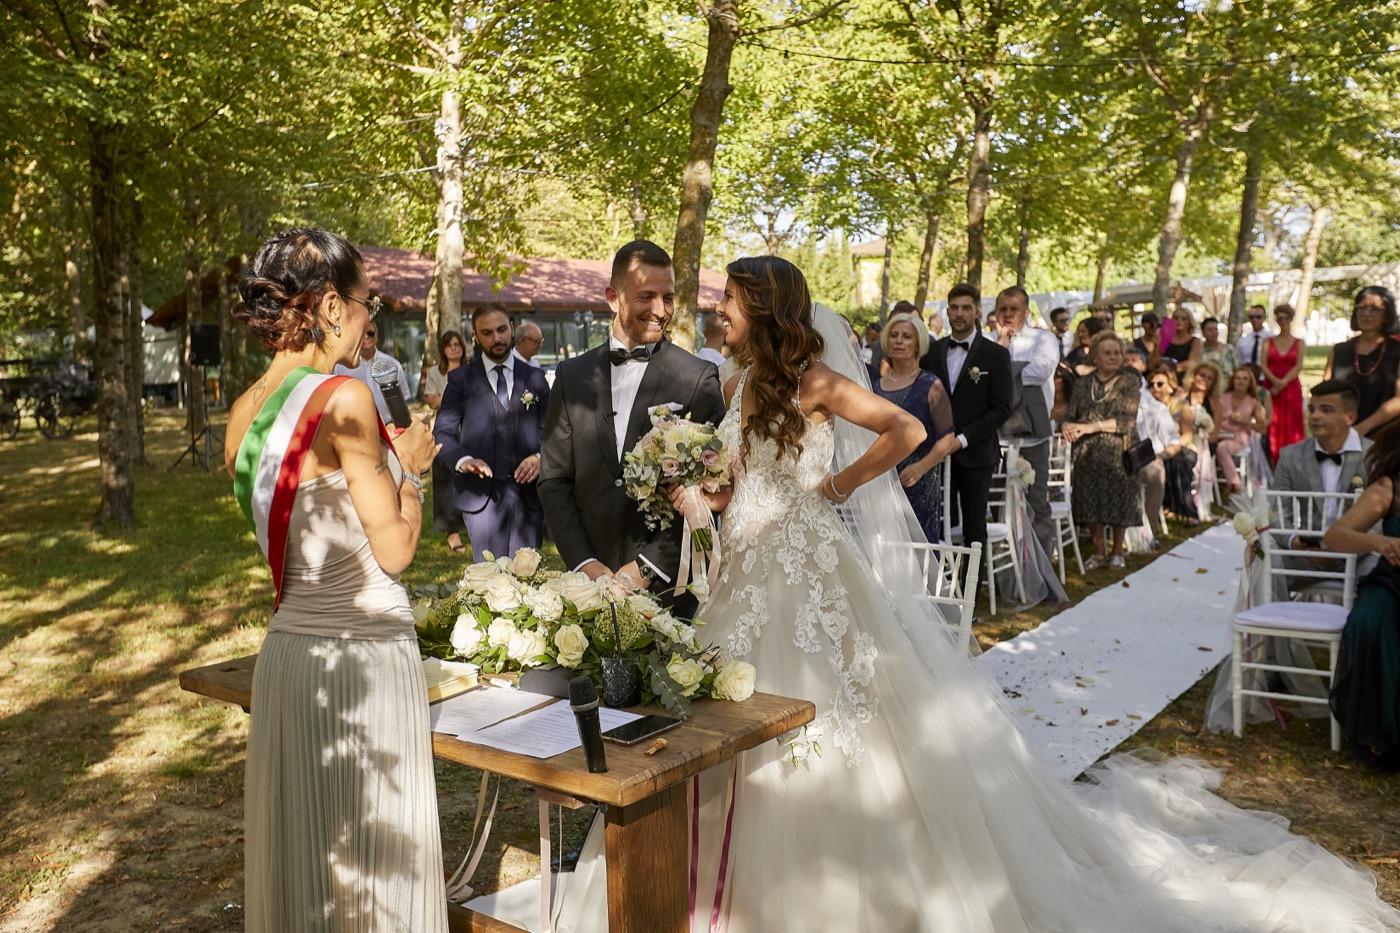 Claudio-Coppola-wedding-photographer-la-scuderia-eventi-preparativi-la-rosetta-perugia-49